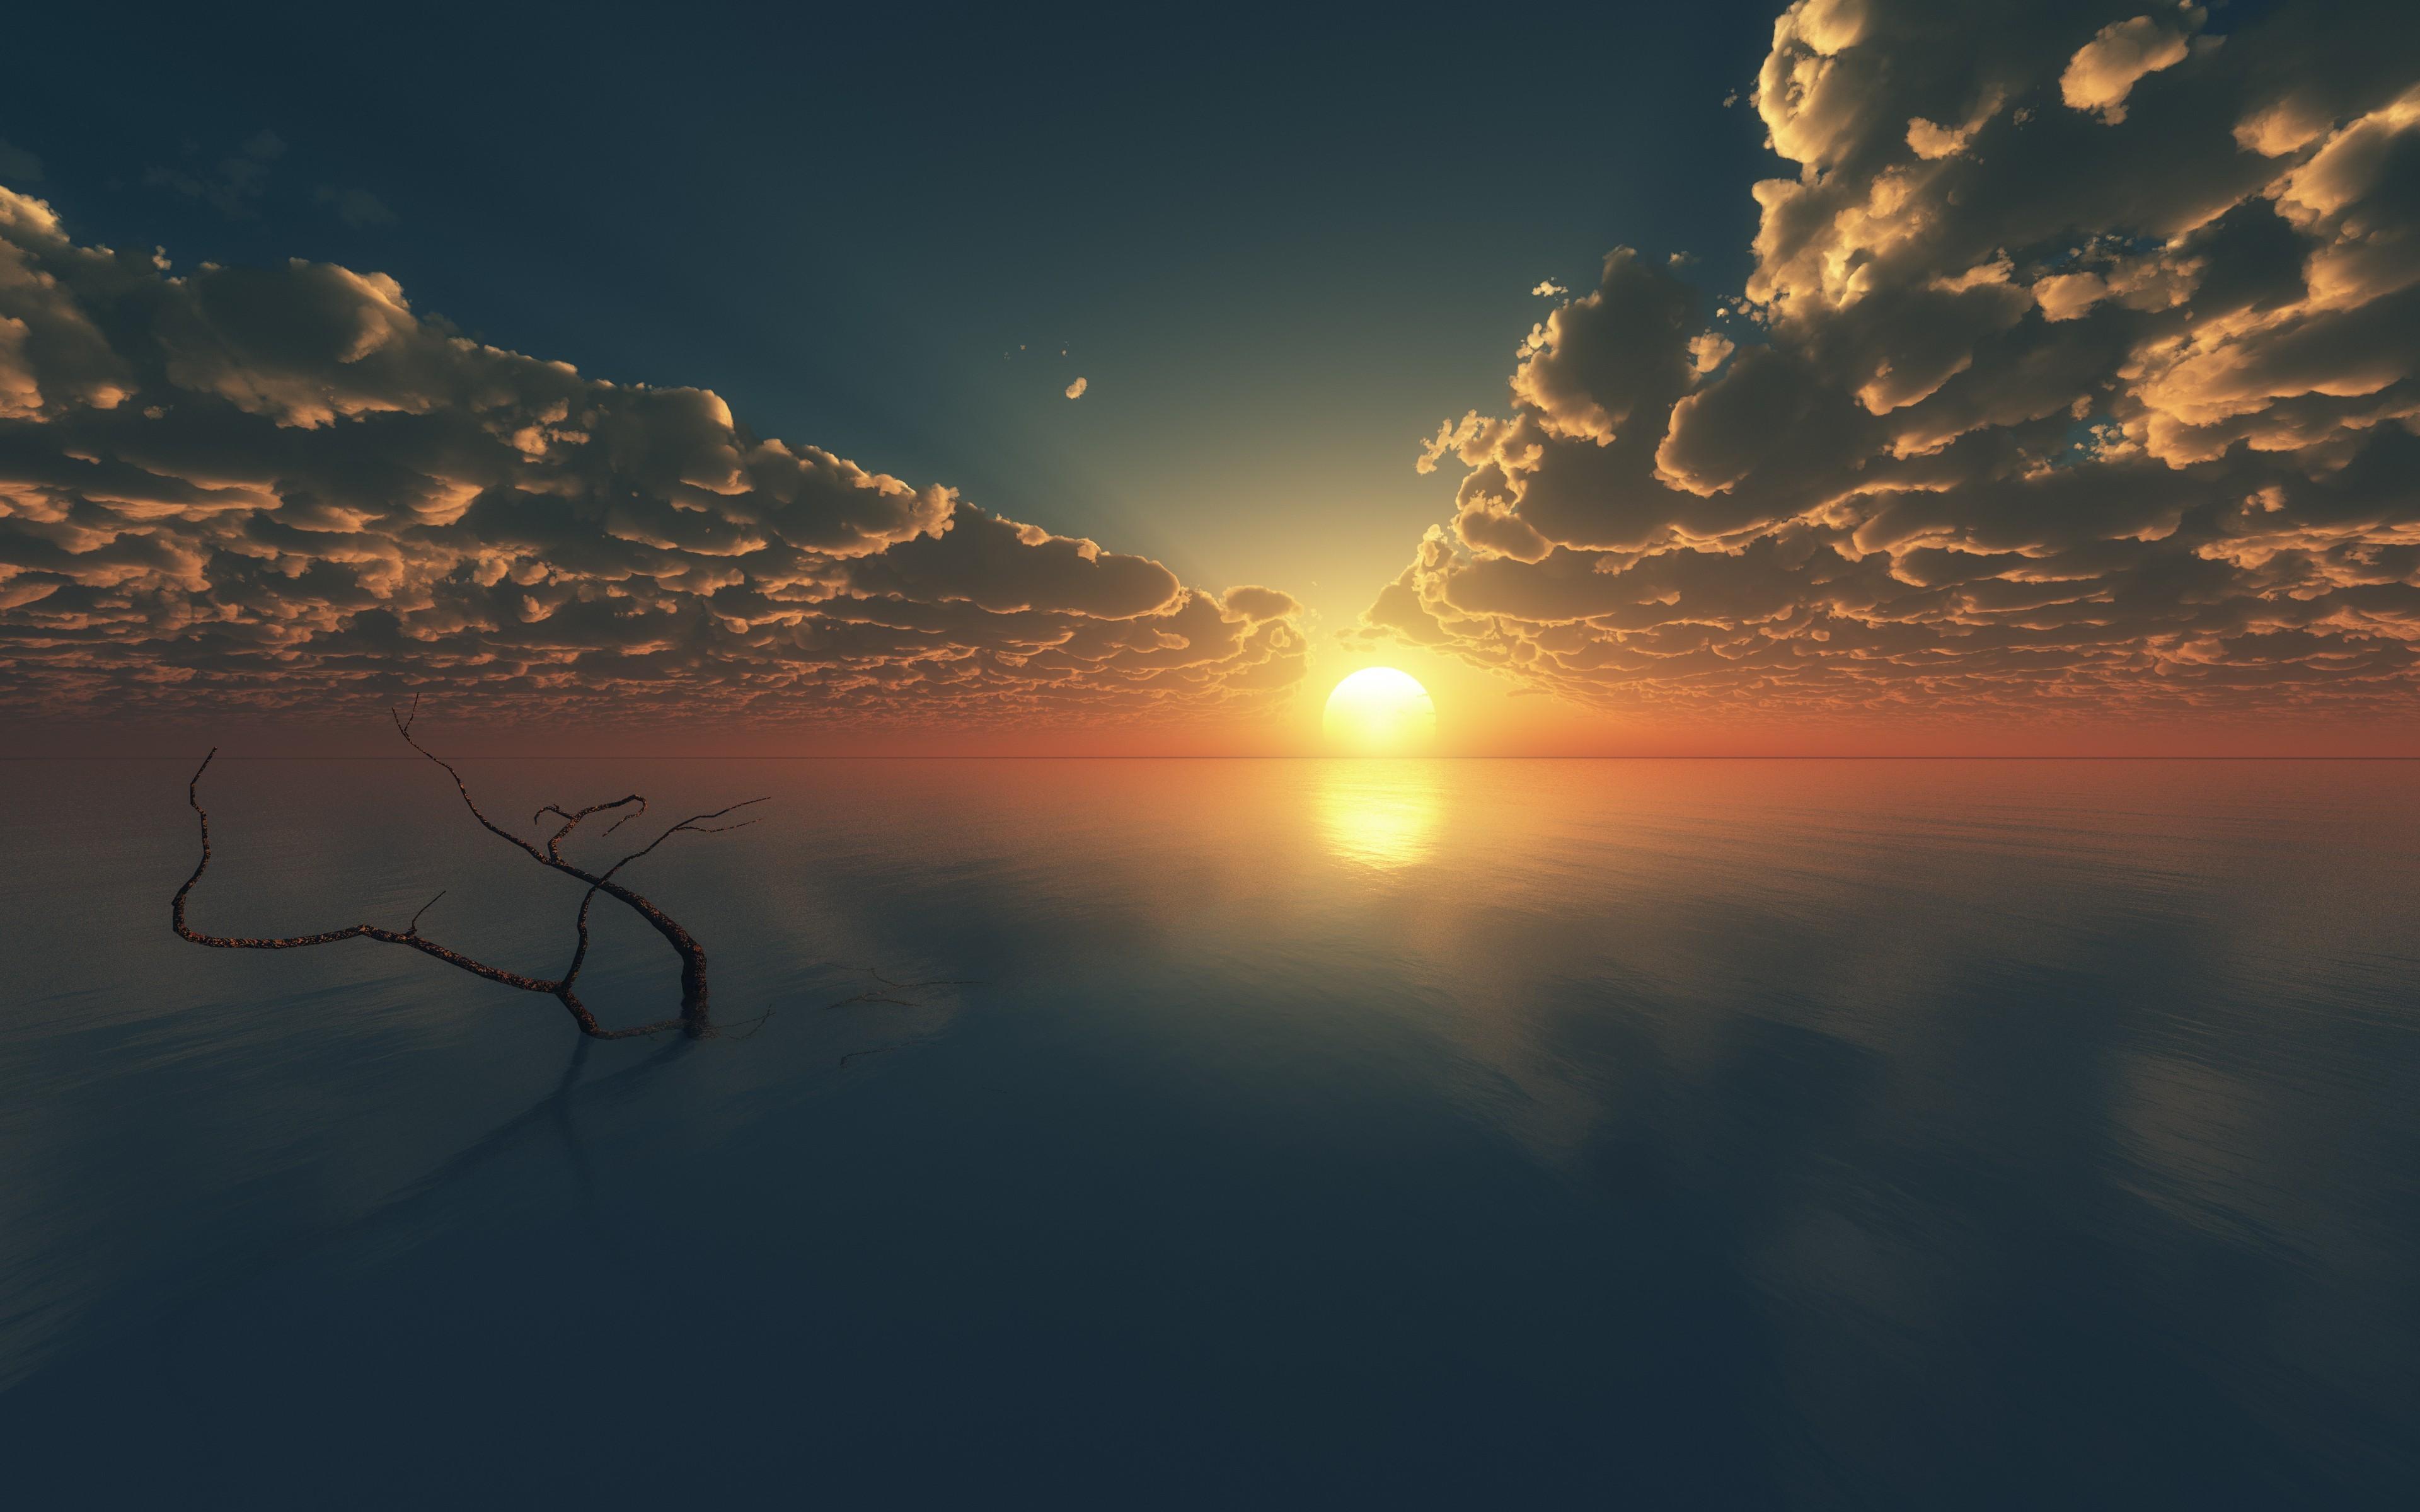 wallpaper sky, 4k, hd wallpaper, clouds, sunset, sunrise, water